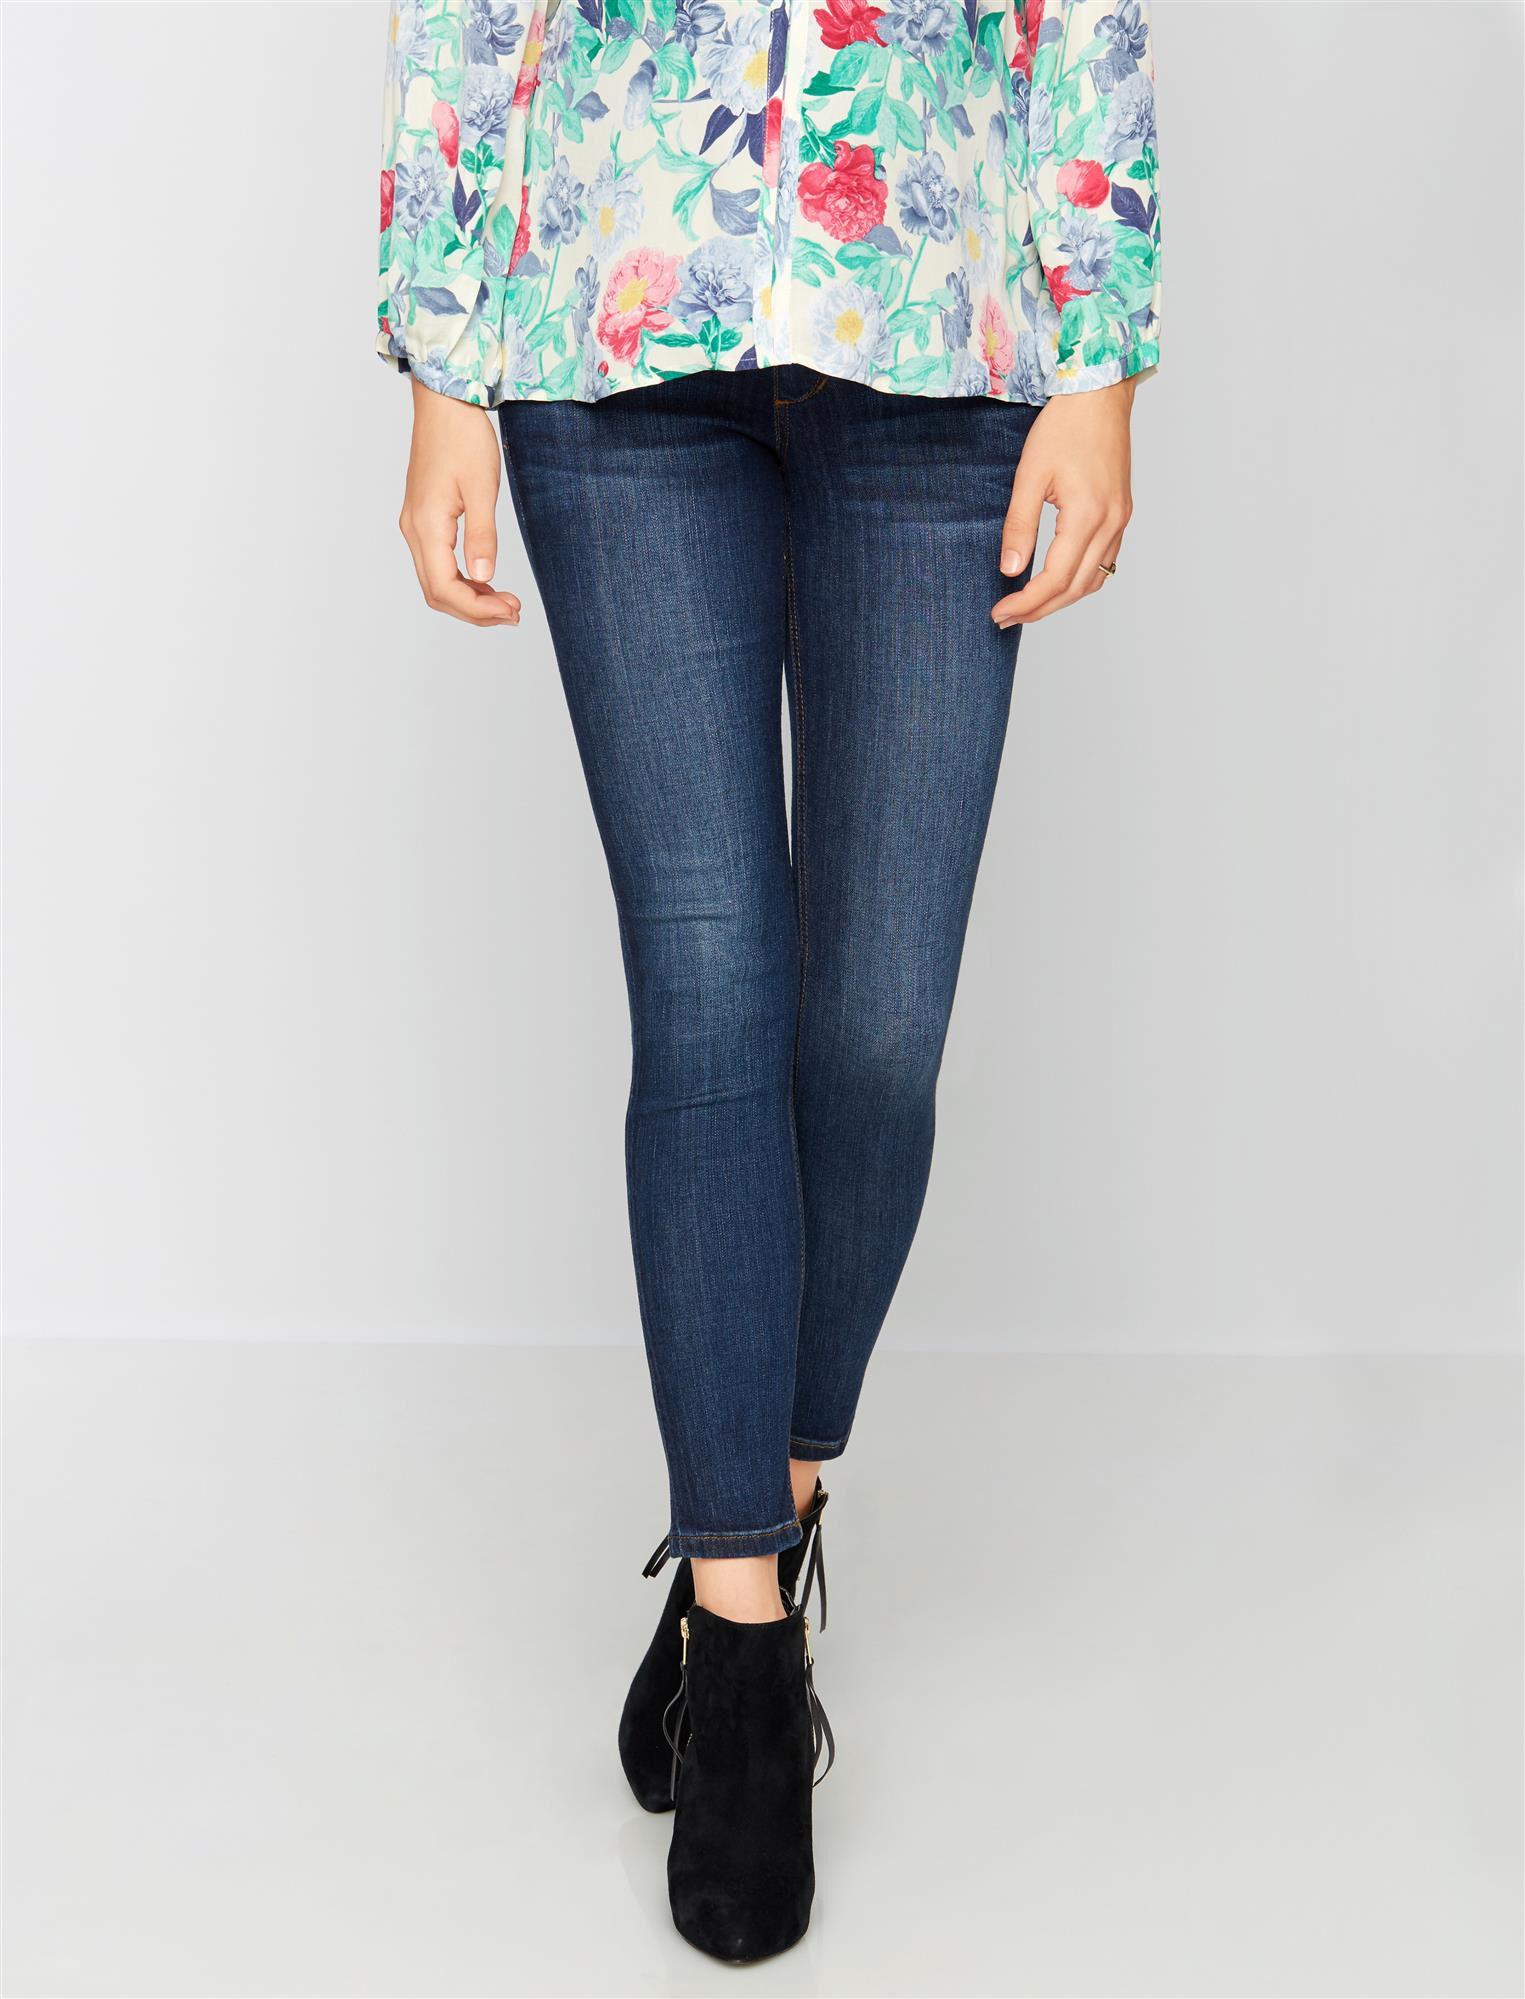 Joe's Jeans Secret Fit Belly The Icon Maternity Jeans- Aimi Dark Wash